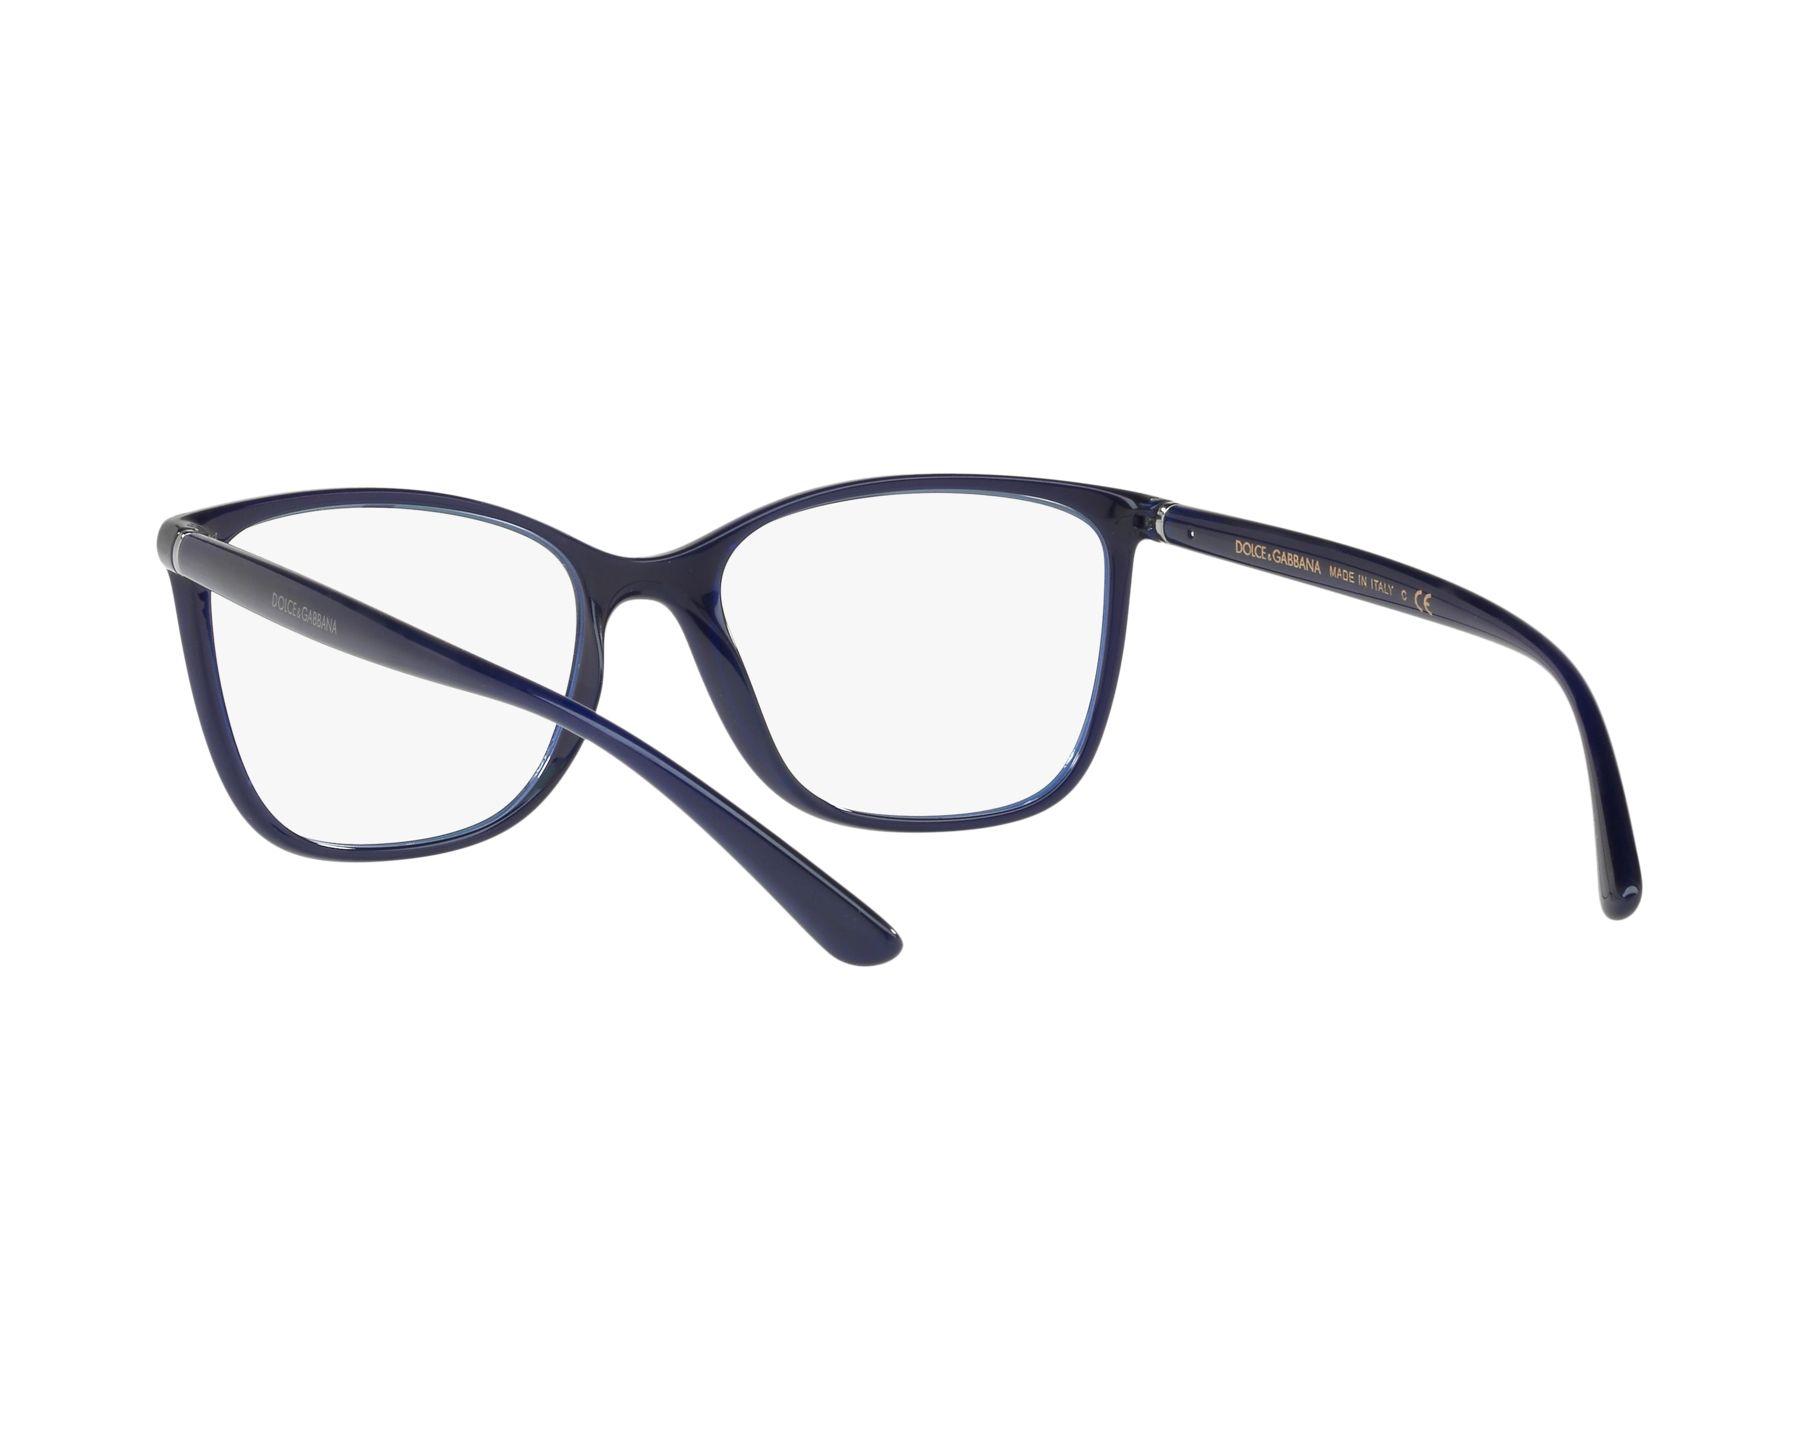 e9999a6ee81 eyeglasses Dolce   Gabbana DG-5026 3094 54-17 Blue 360 degree view 6